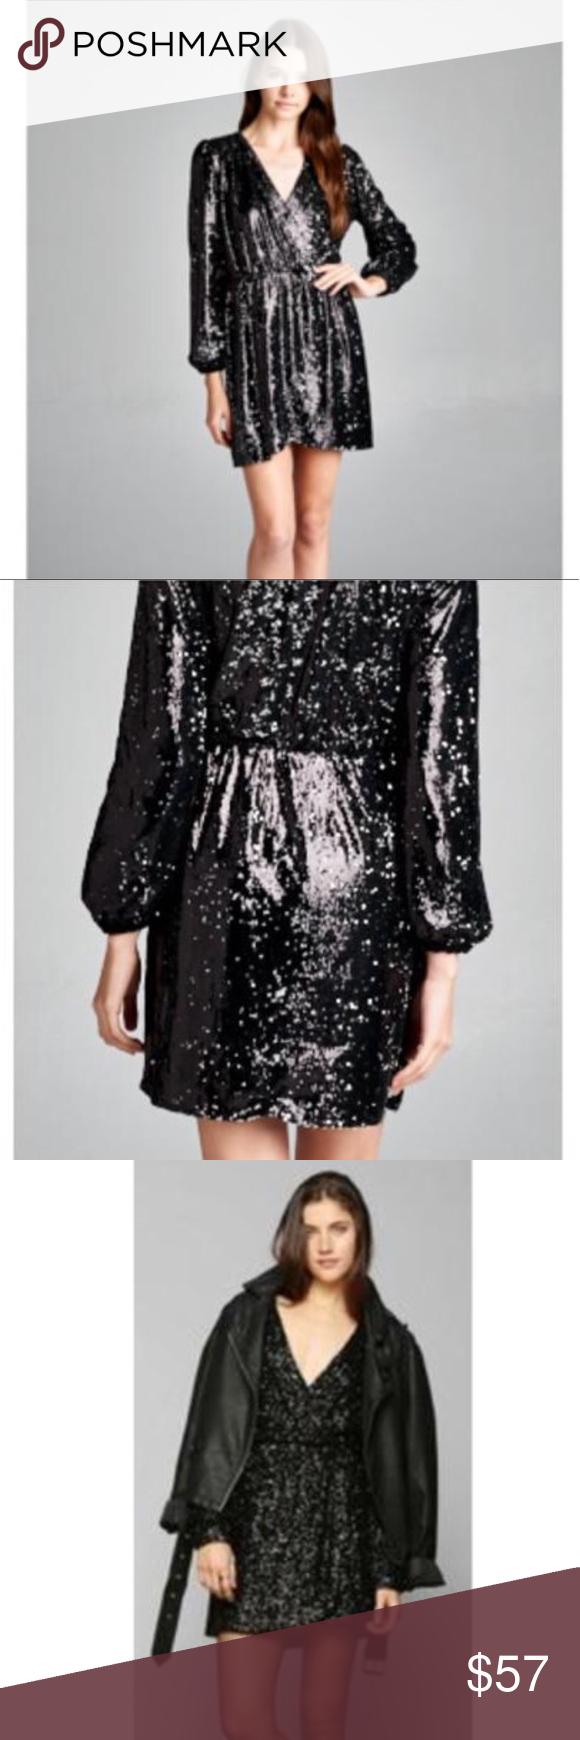 Lourdes black sequin wrap dress dress brands size model and black